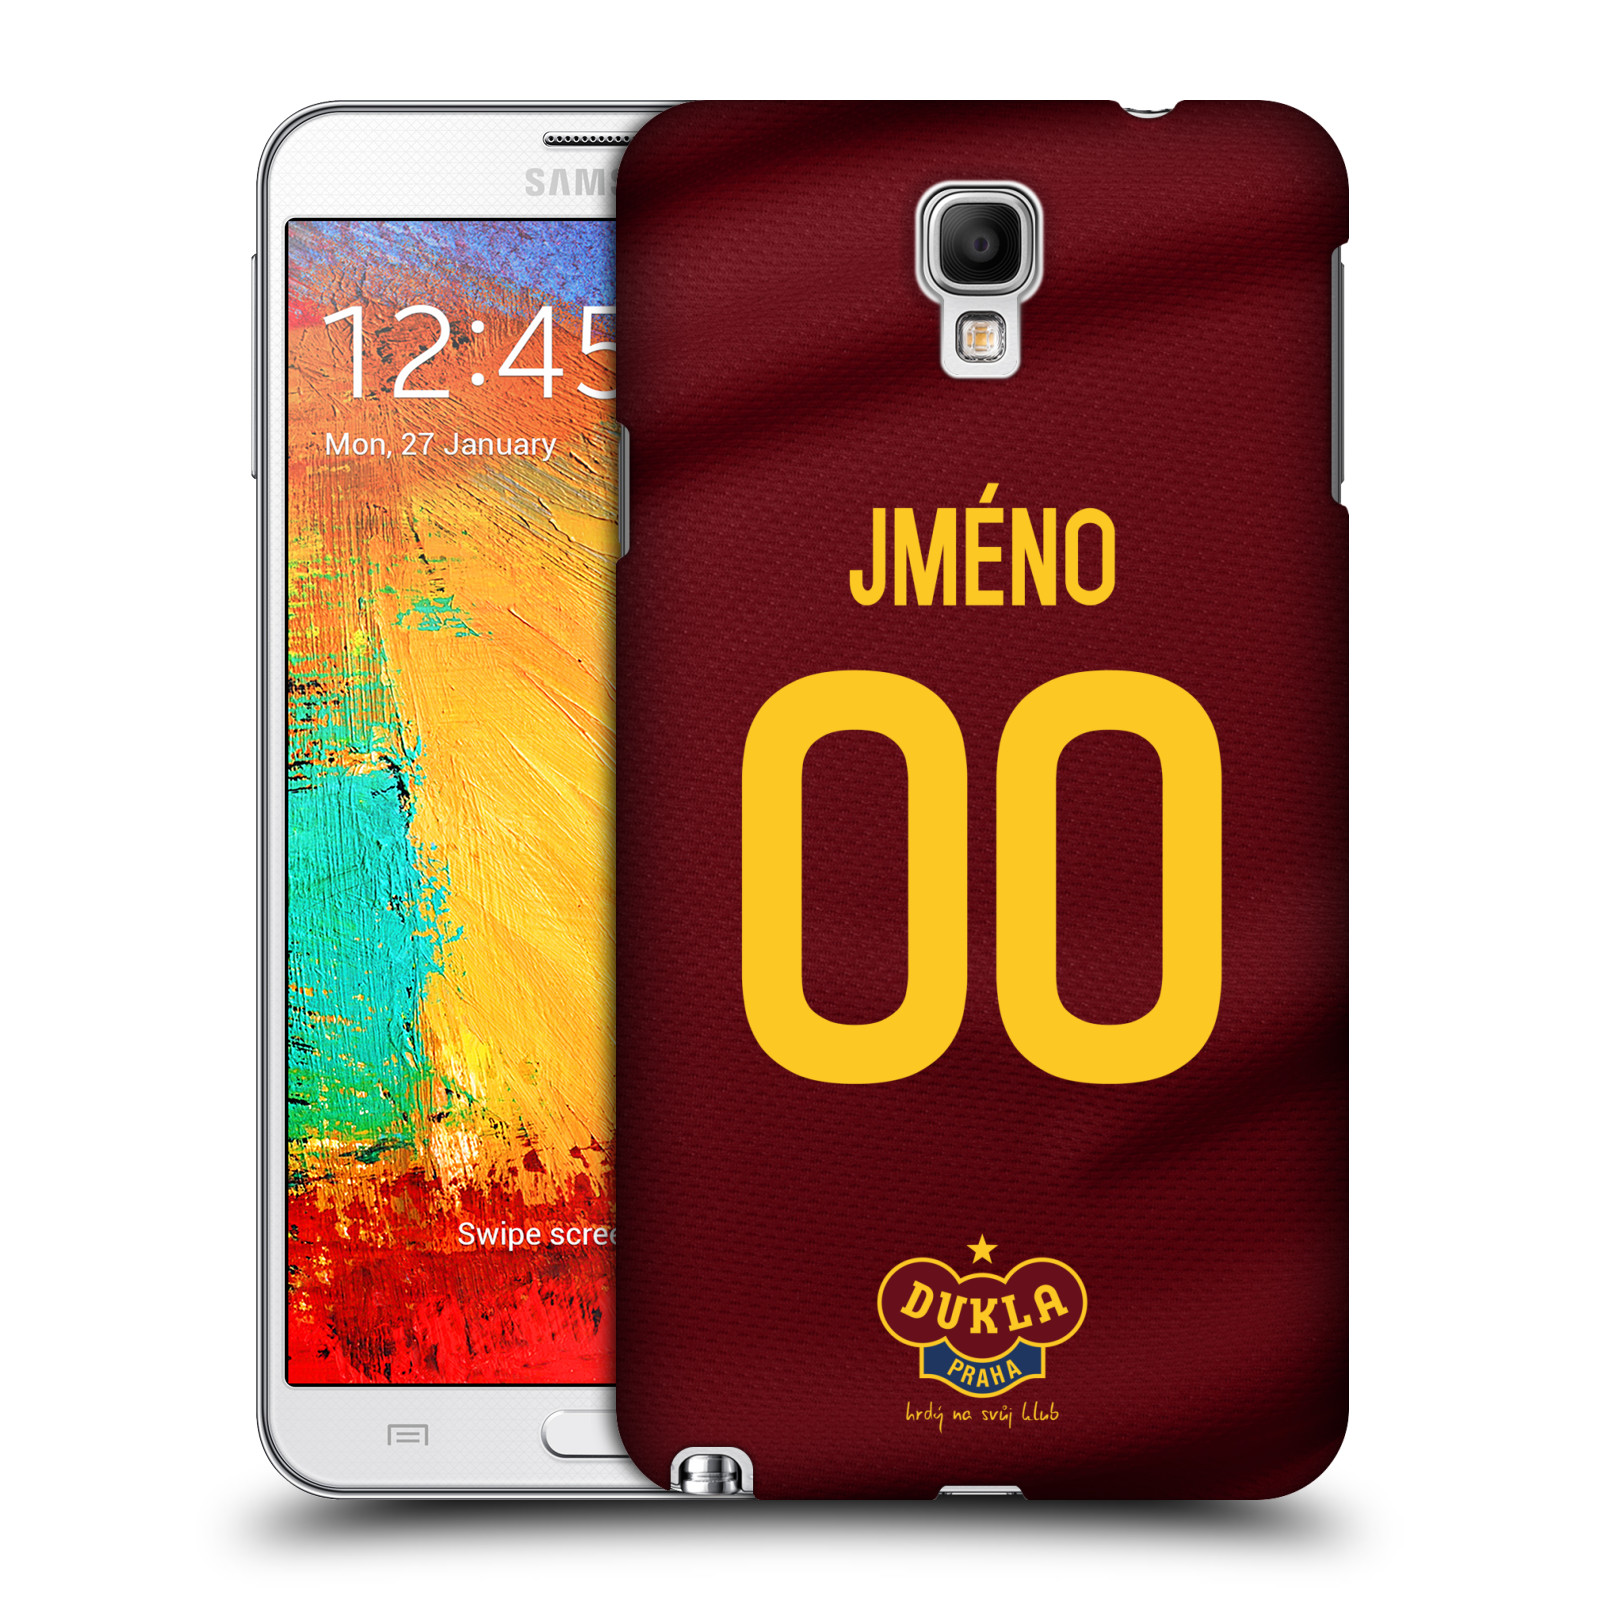 Plastové pouzdro na mobil Samsung Galaxy Note 3 Neo - FK Dukla Praha - dres s vlastním jménem a číslem